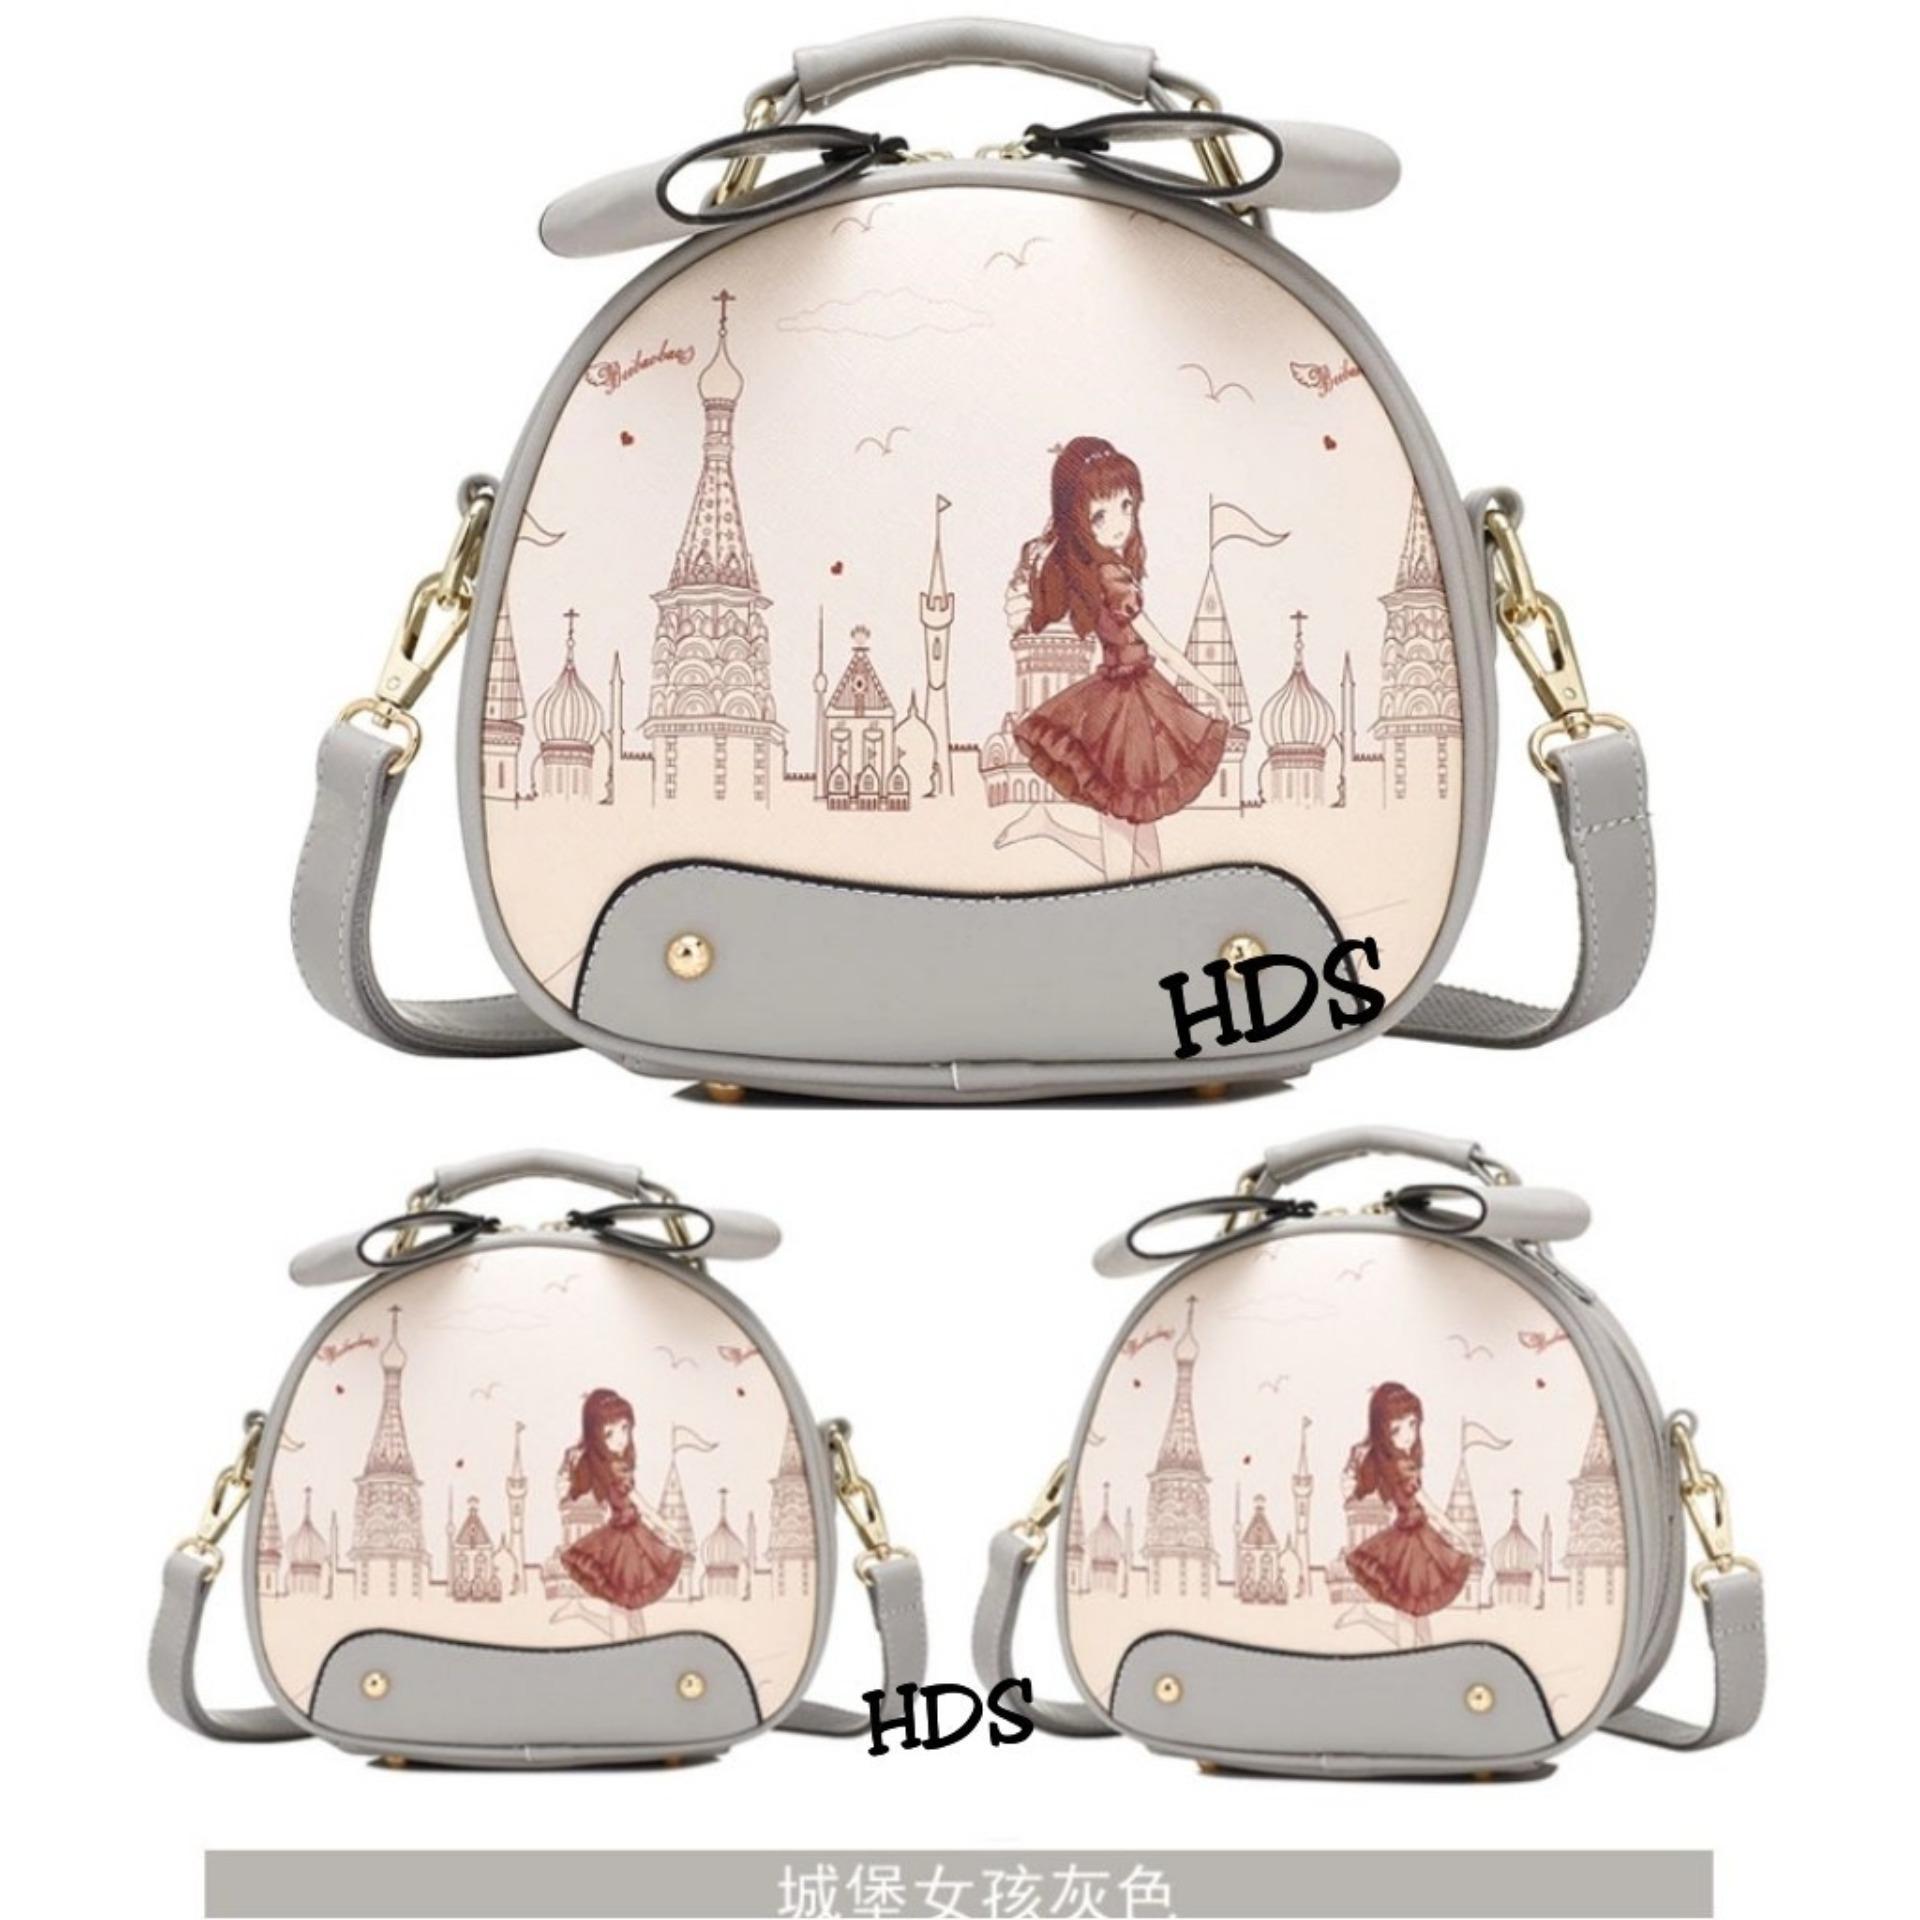 Kelebihan Sling Bag Korean Style Happy Girl Tas Selempang Wanita Printing Ovale In Frame